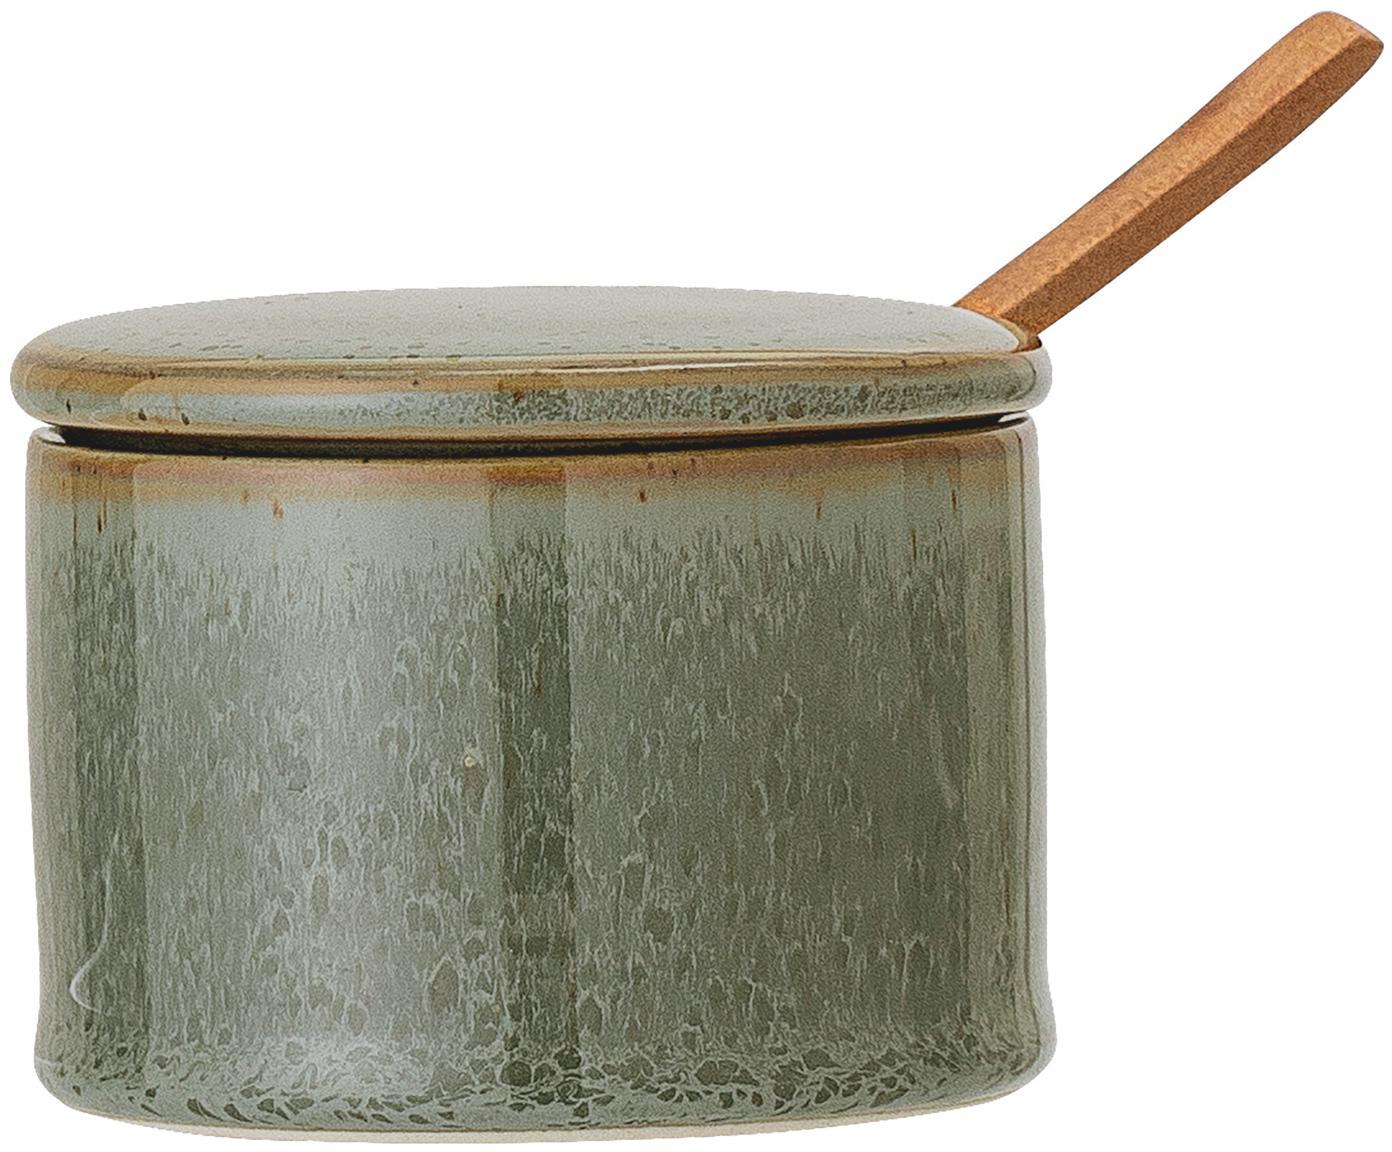 Suikerpot Pixie, met lepel, Pot: keramiek, Lepel: acaciahout, Groentinten, Ø 8 x H 6 cm